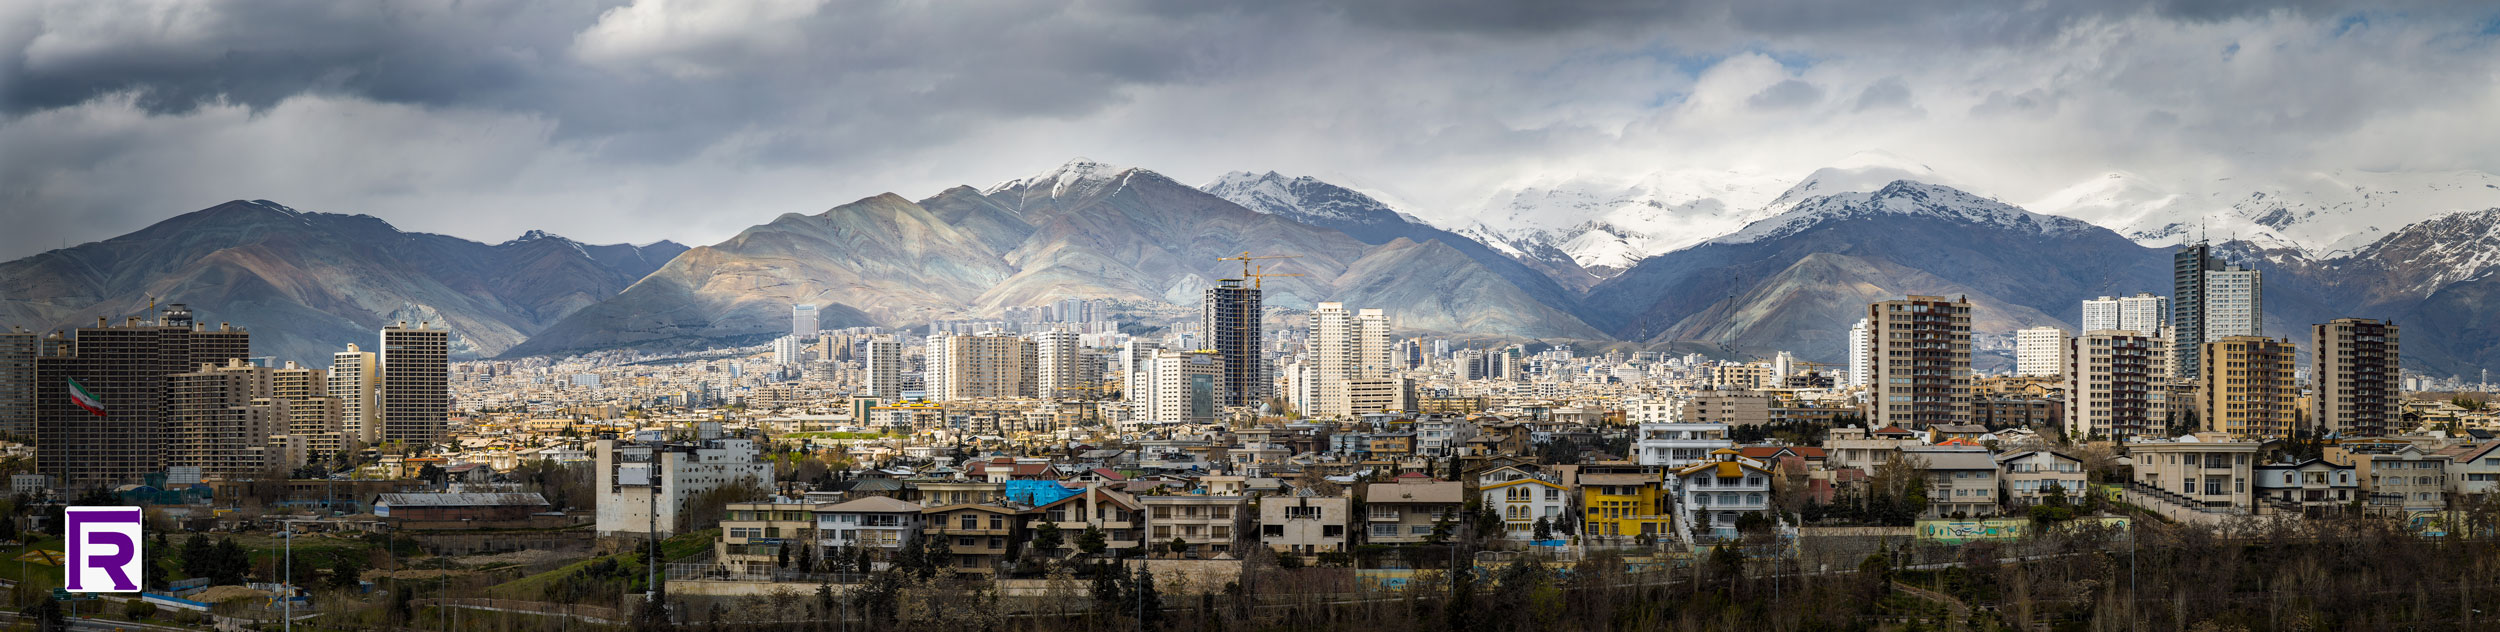 Tehran full wide image